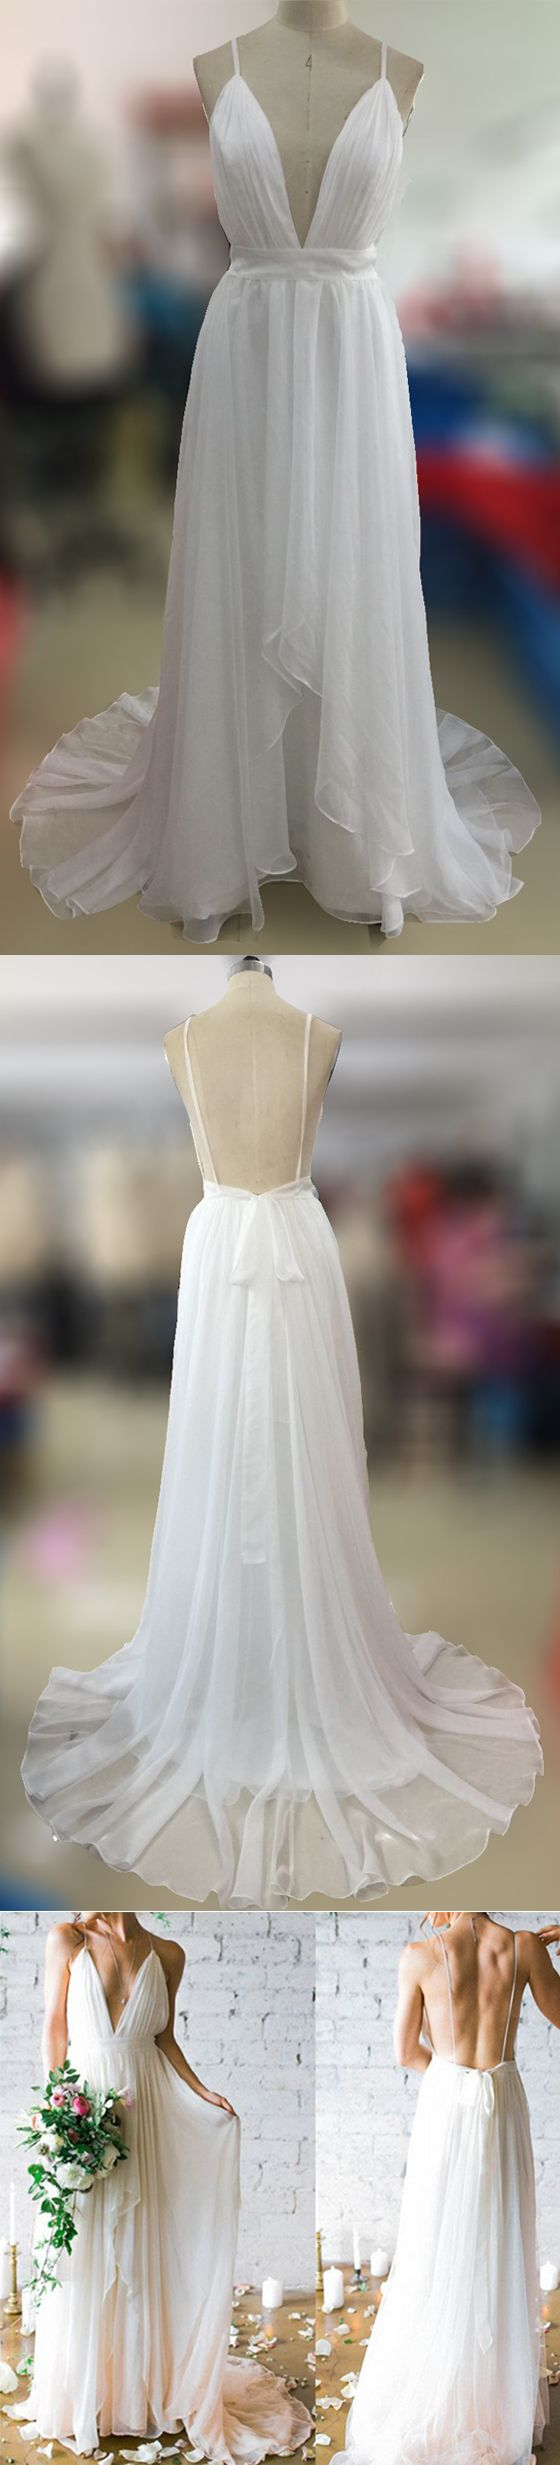 Affordable simple open back white v neck beach wedding dresses